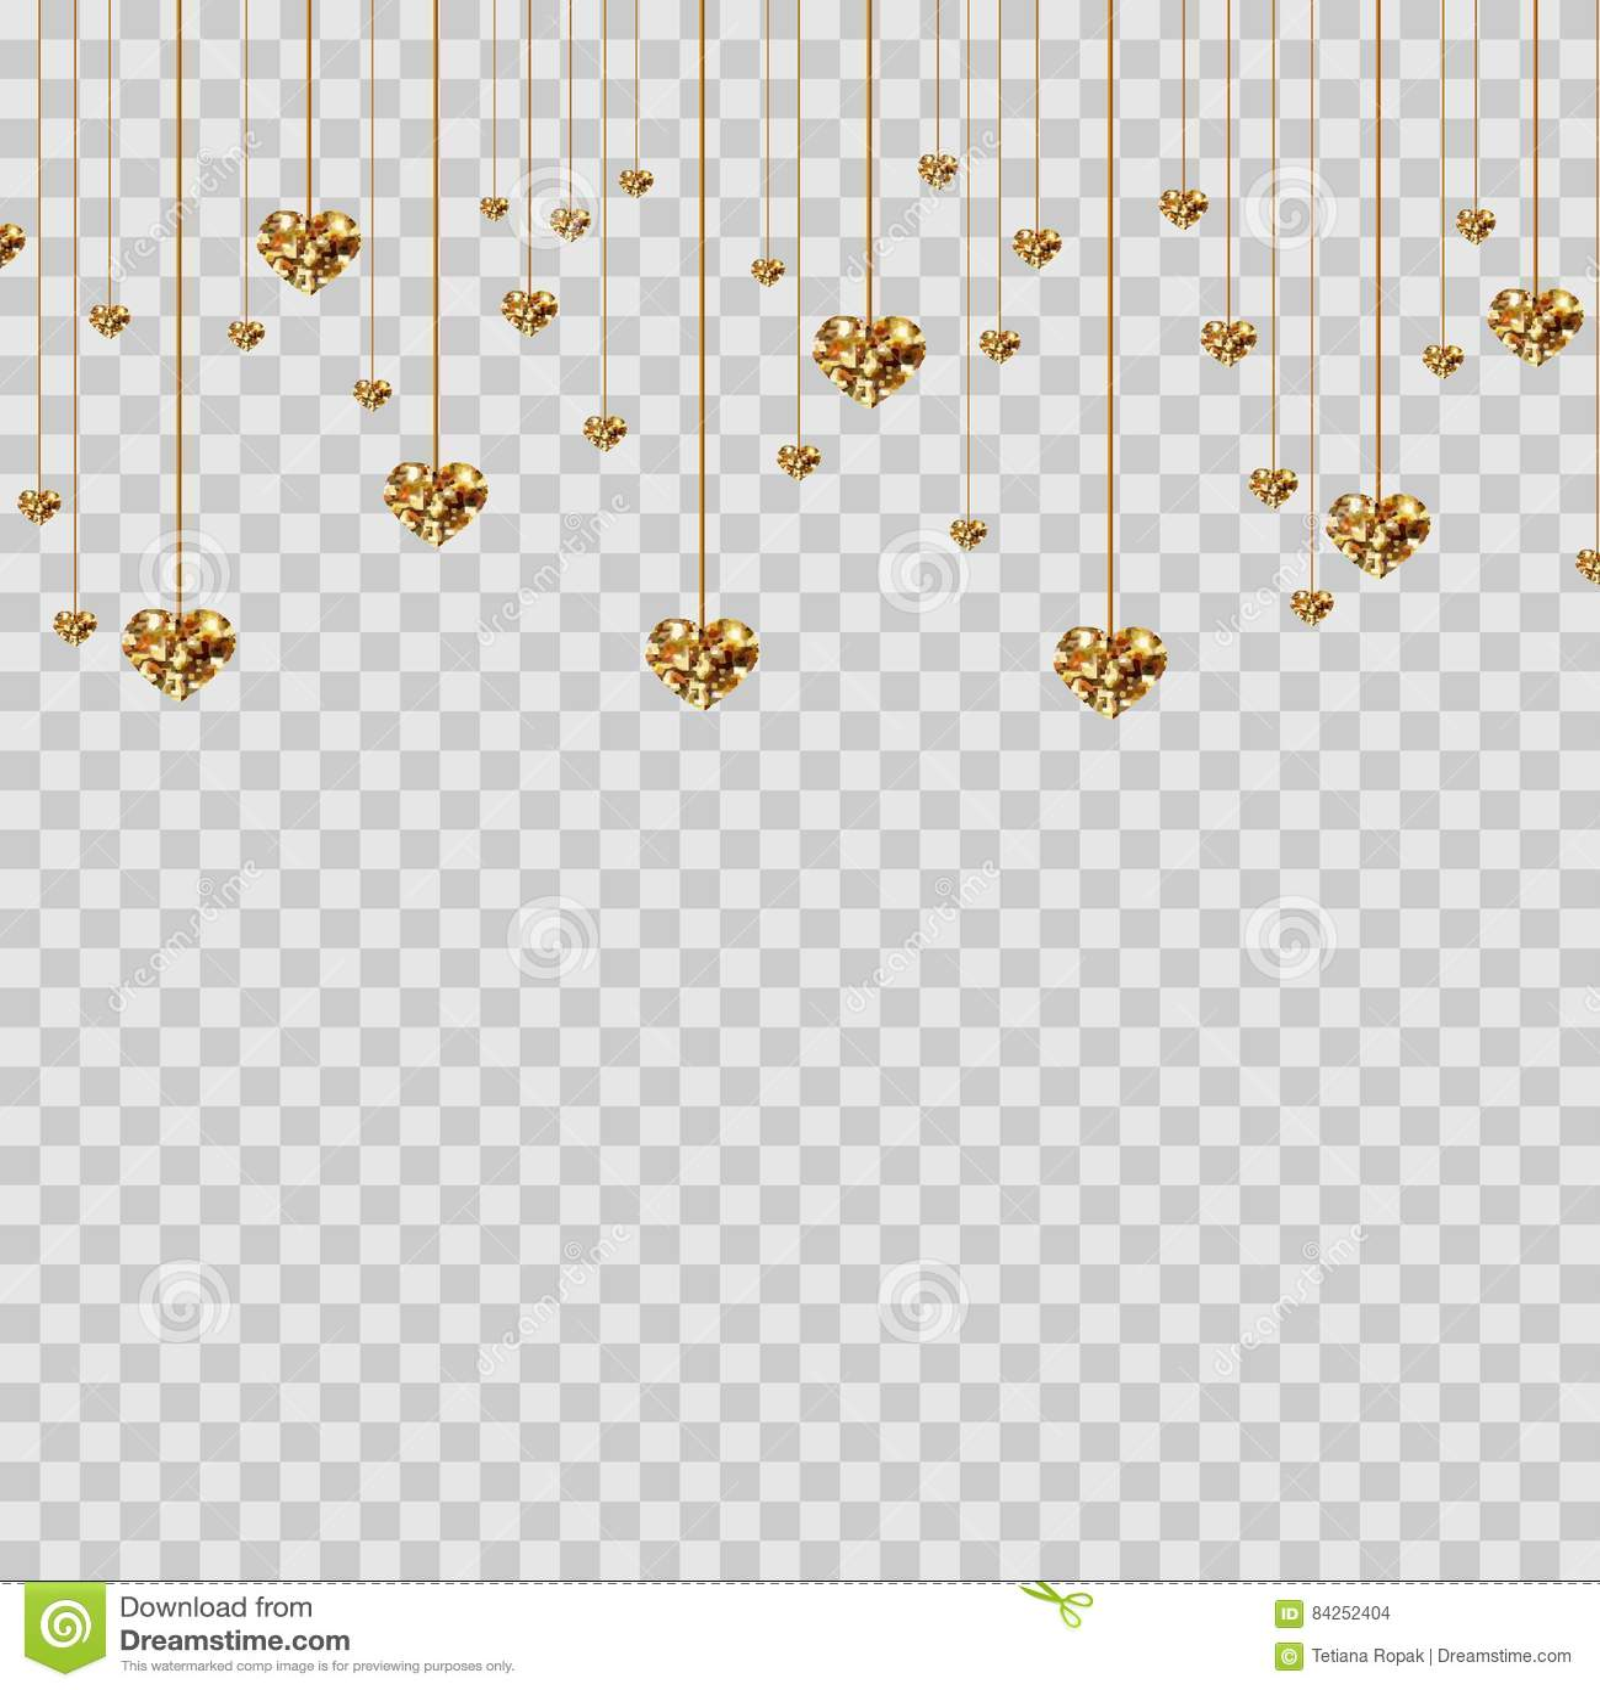 gold glitter valentine hearts on transparent background luxury